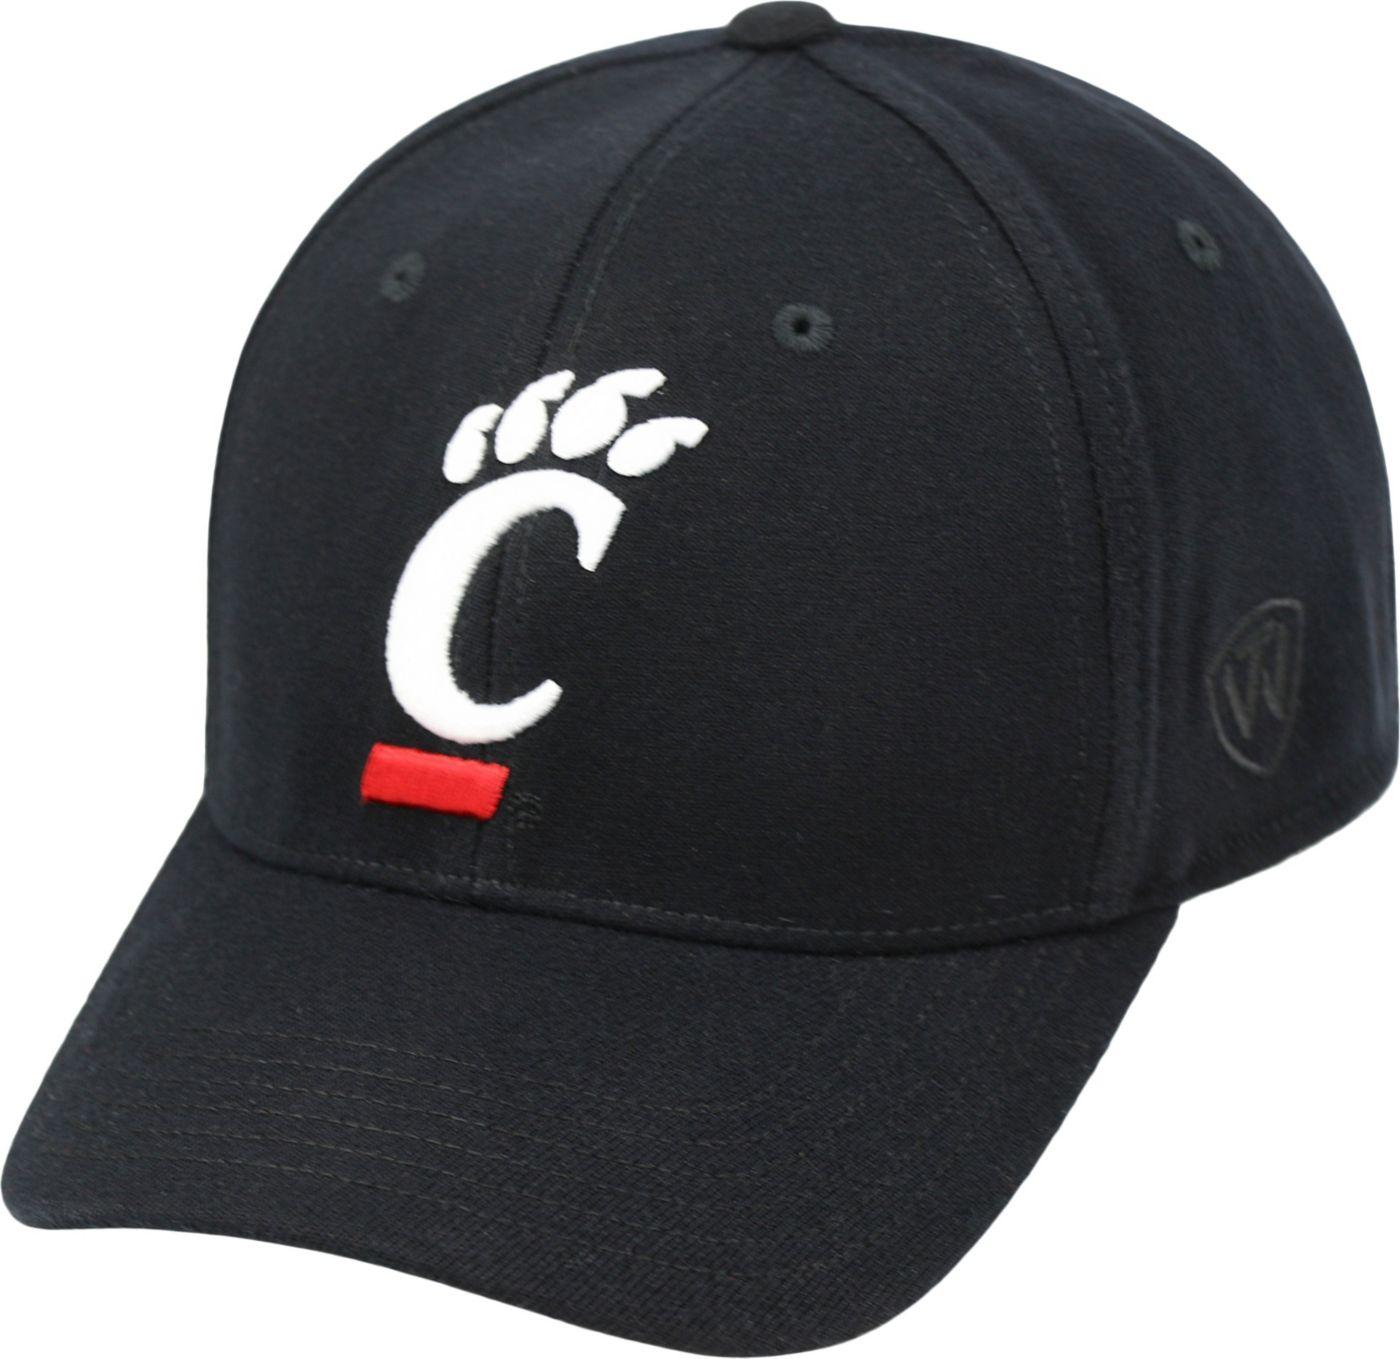 Top of the World Men's Cincinnati Bearcats Black Premium Collection M-Fit Hat